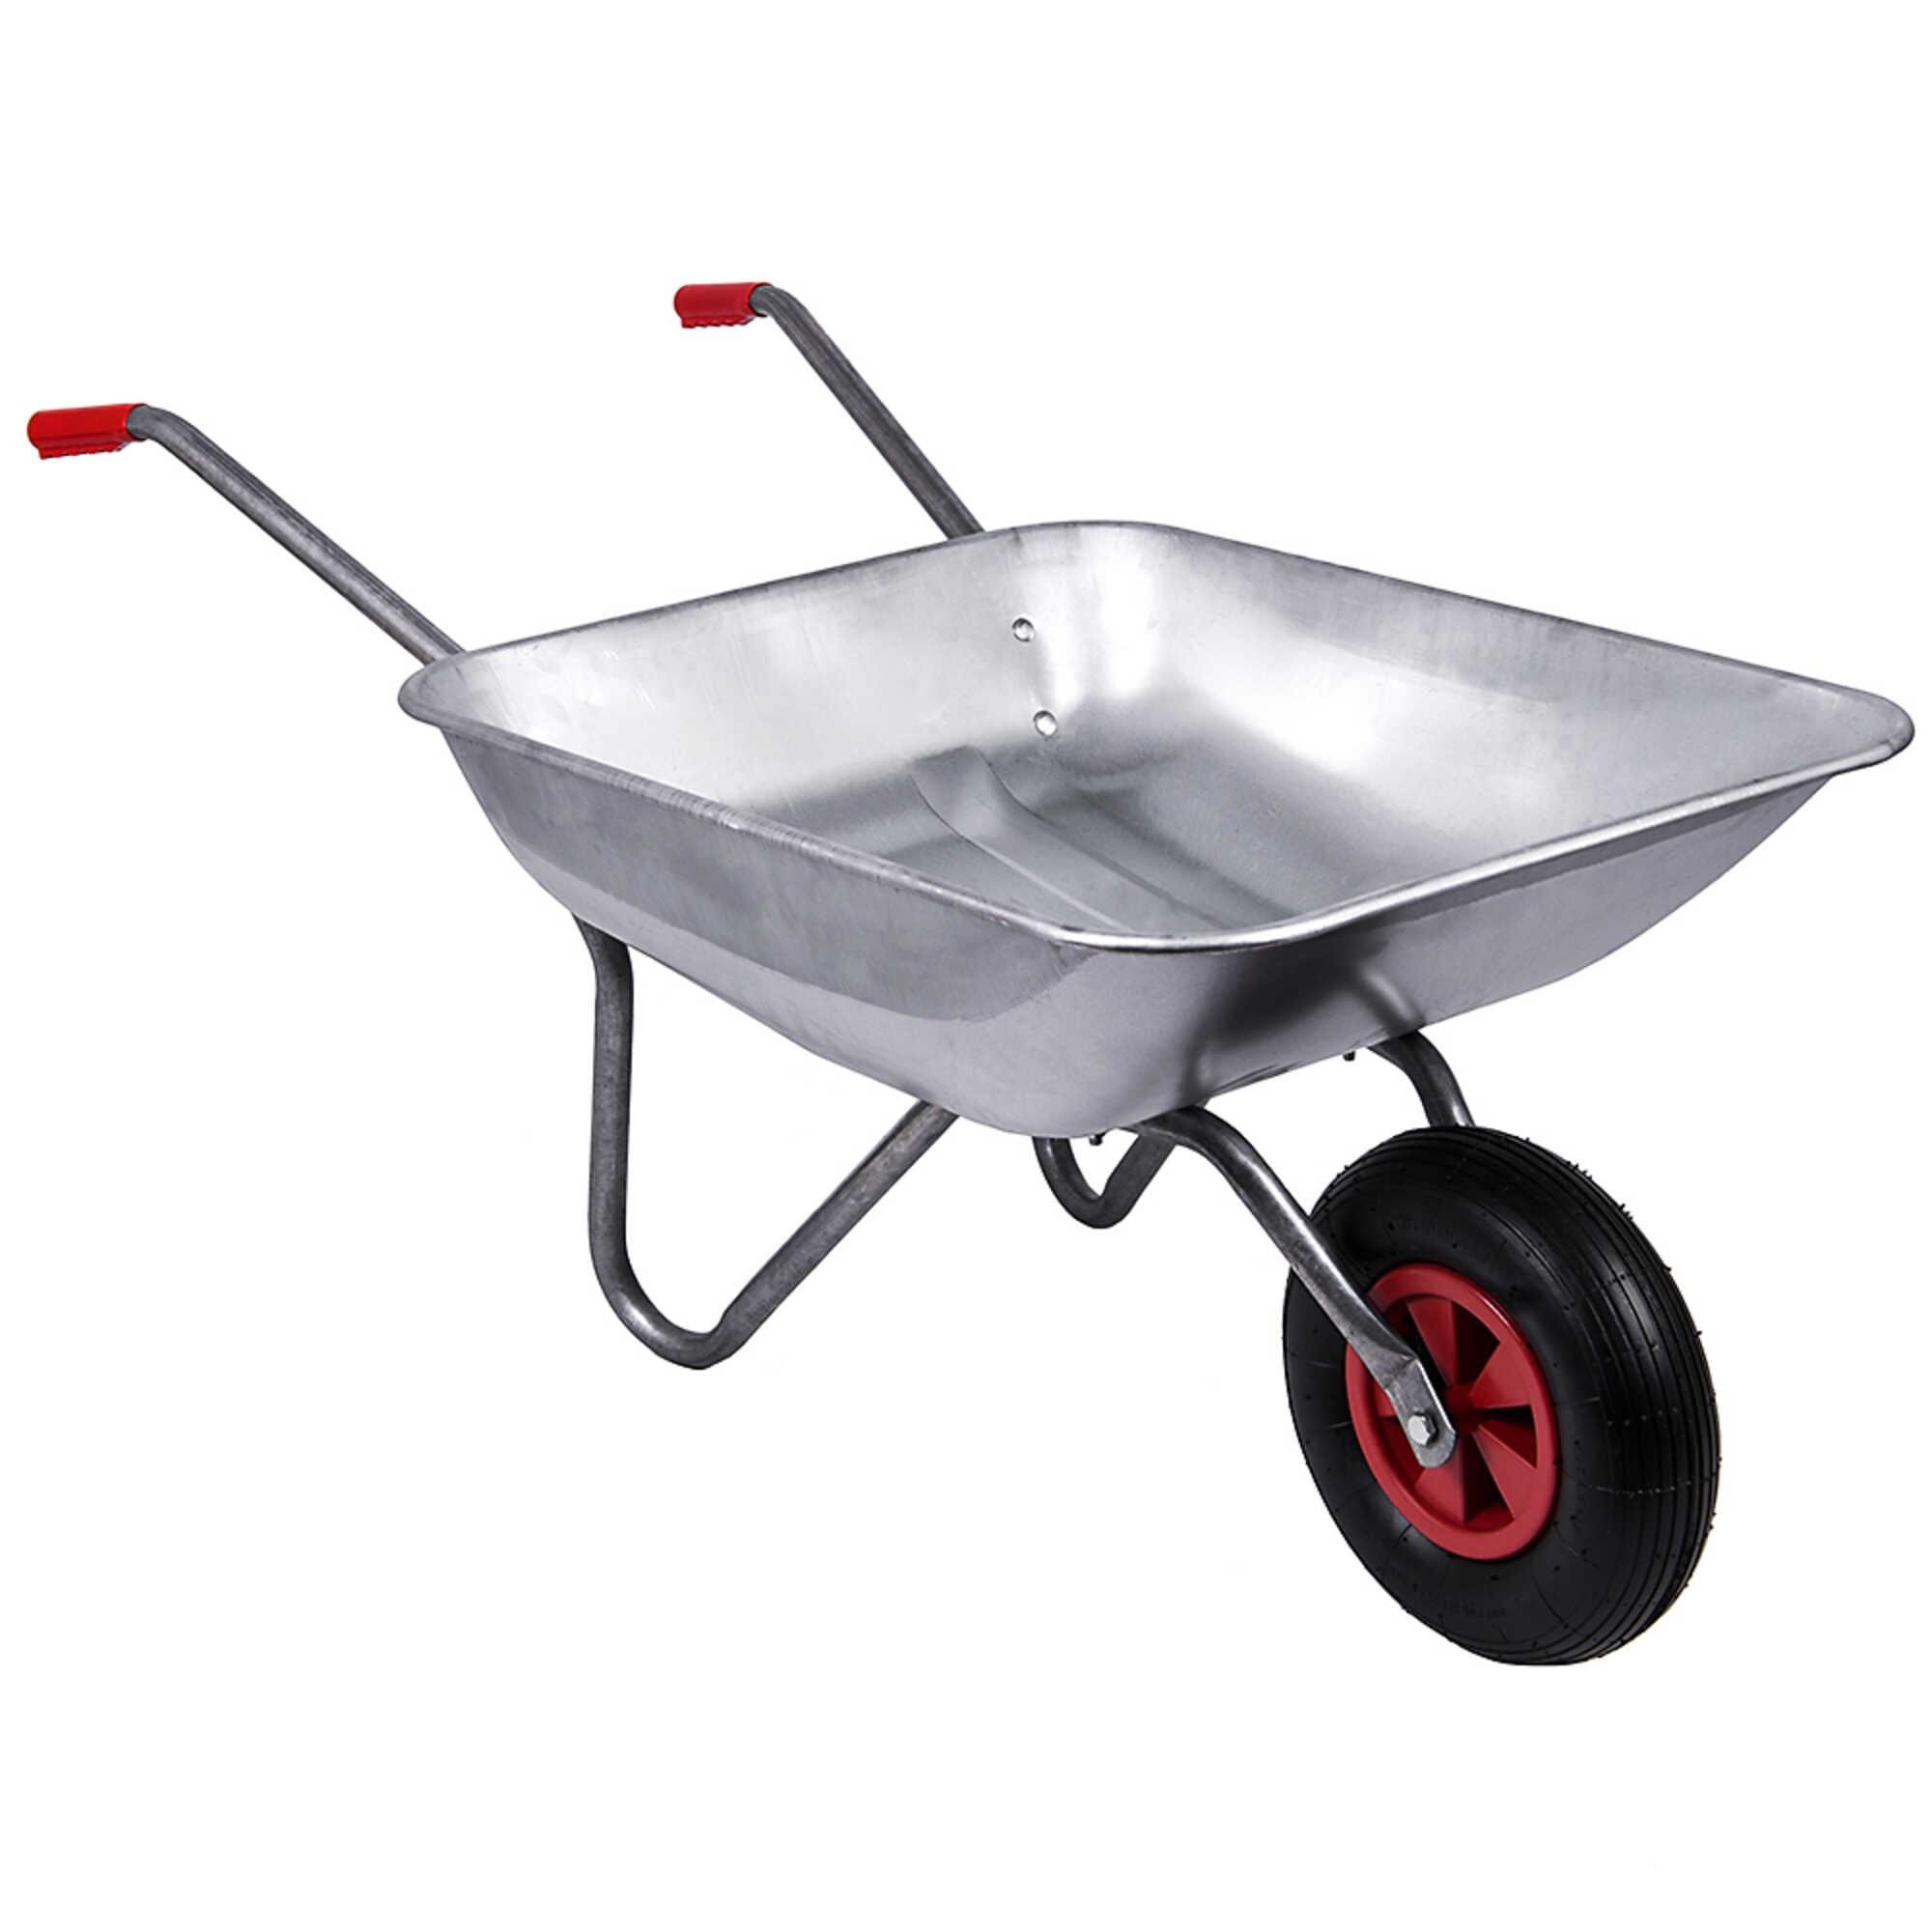 Wheelbarrow for sale near me wall mixer with overhead shower